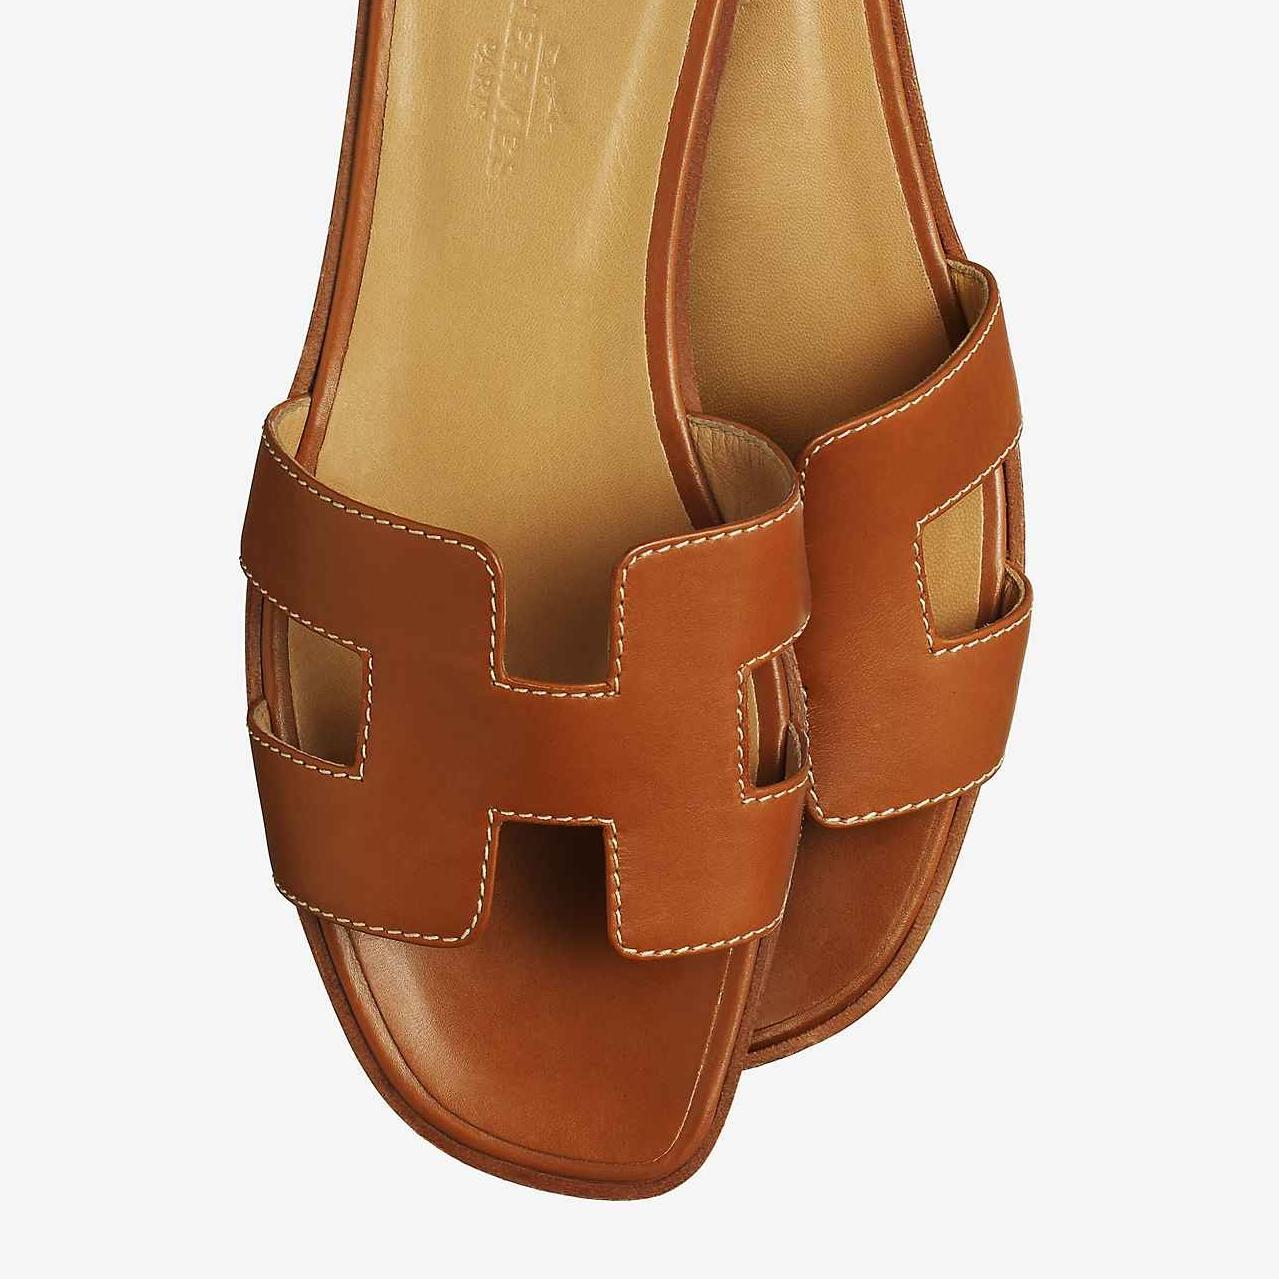 Their Dupes #3 Hermes Oran Sandal